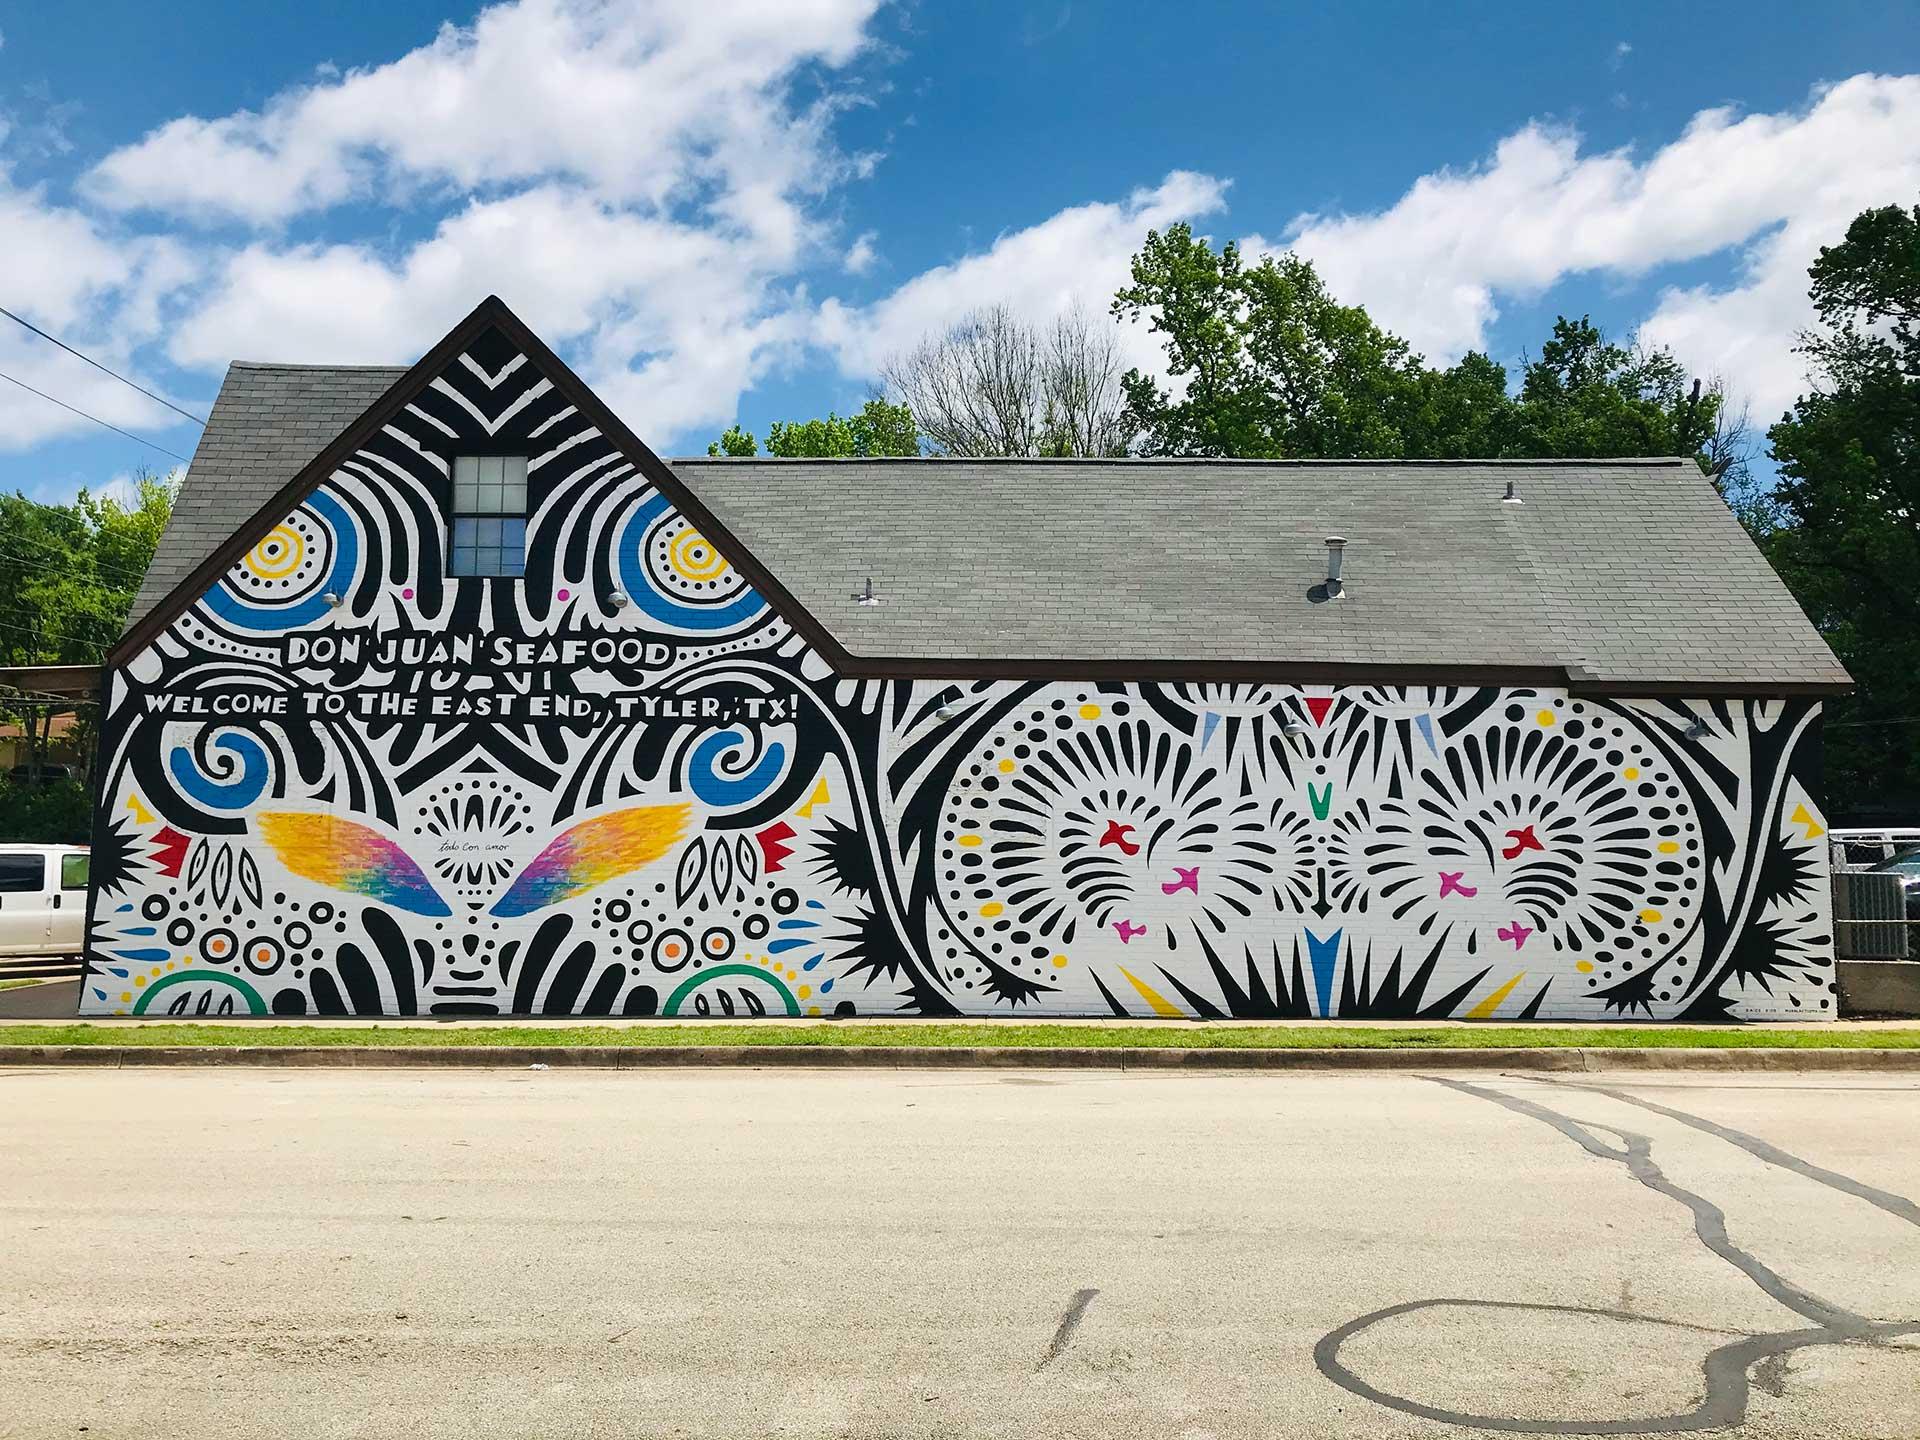 todo con amor mural - wings mural - mariscos mural - abstract mural - large scale mural - Dace Kidd - Mural Artist Tx